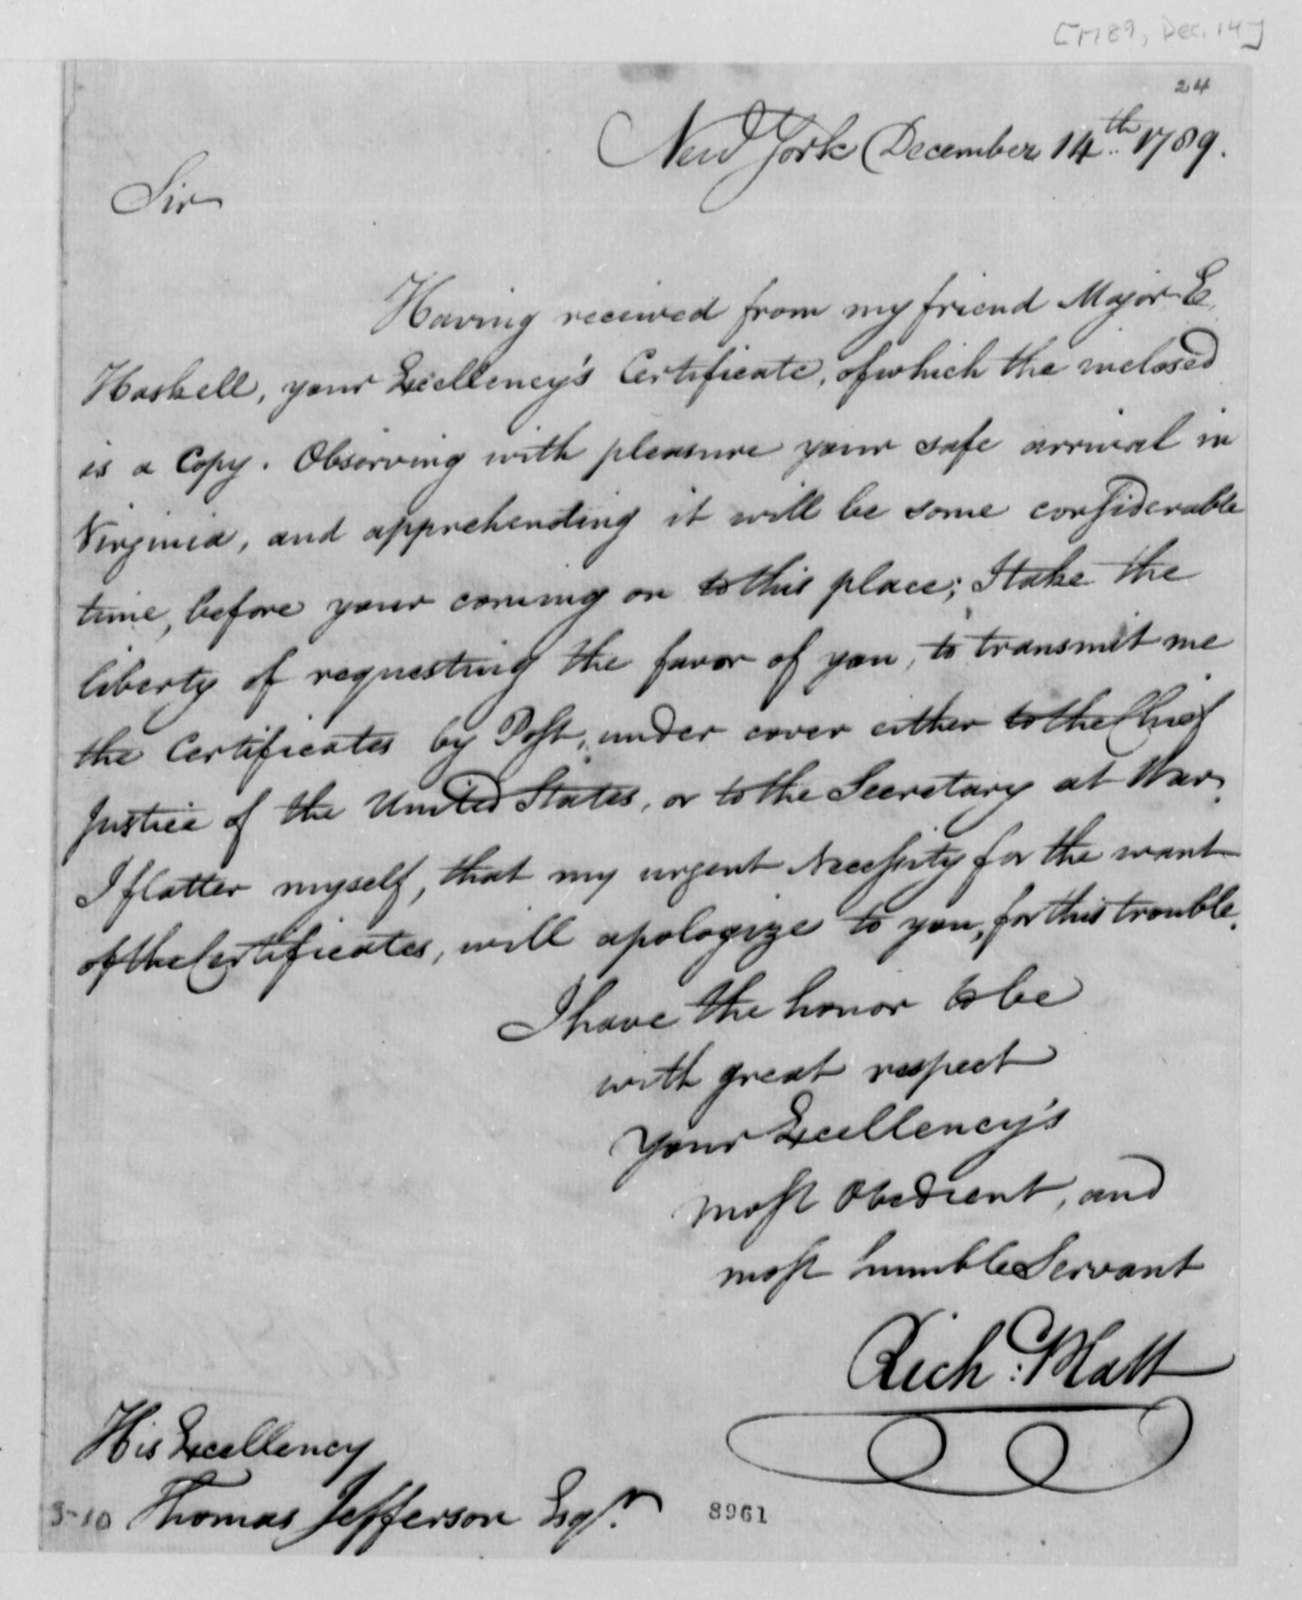 Richard Platt to Thomas Jefferson, December 14, 1789